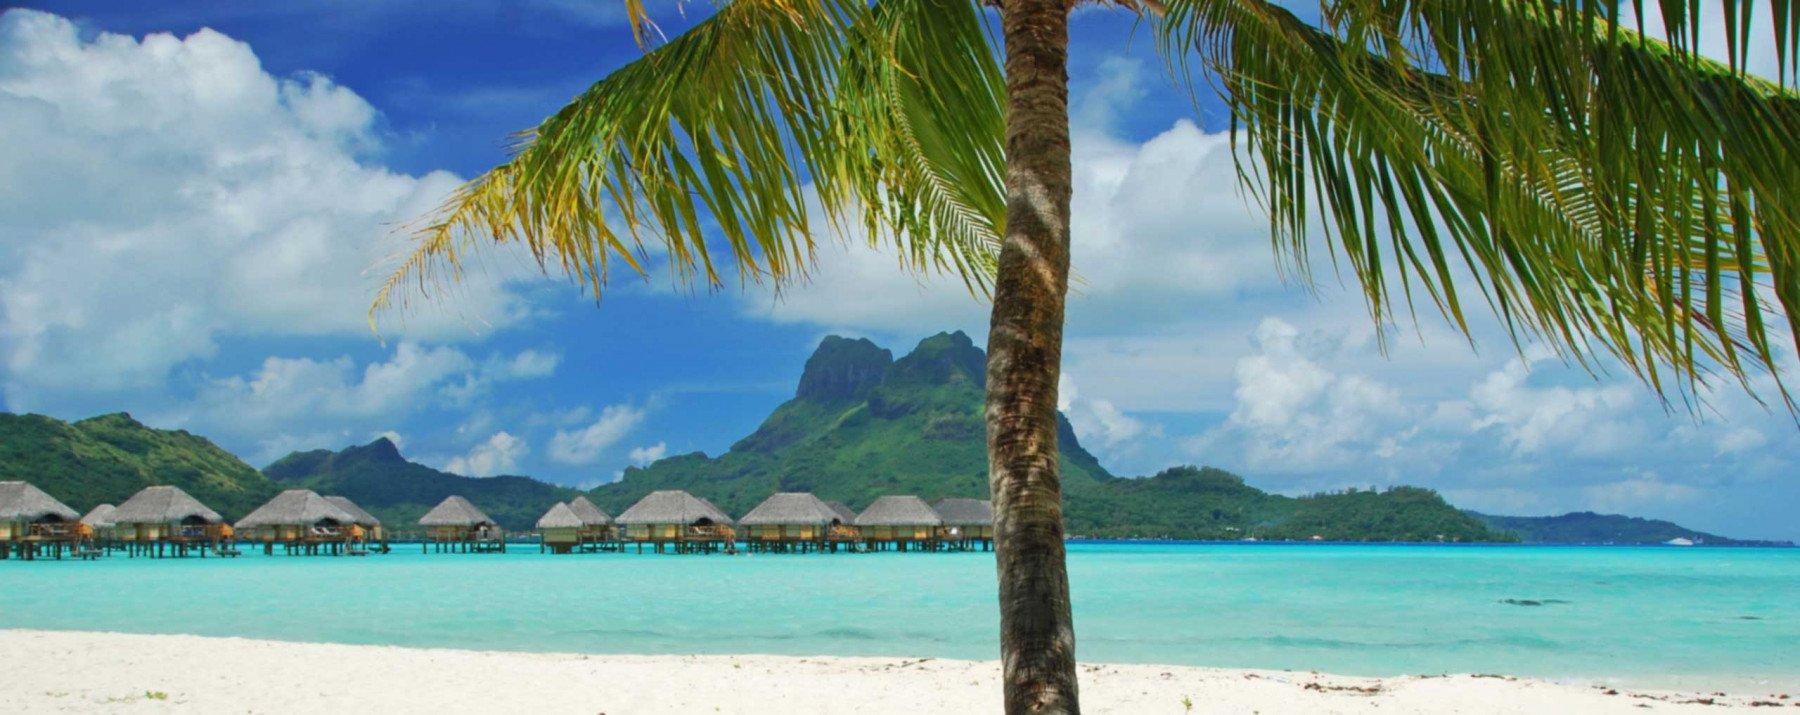 En palm står i förgrunden av en tropisk strand